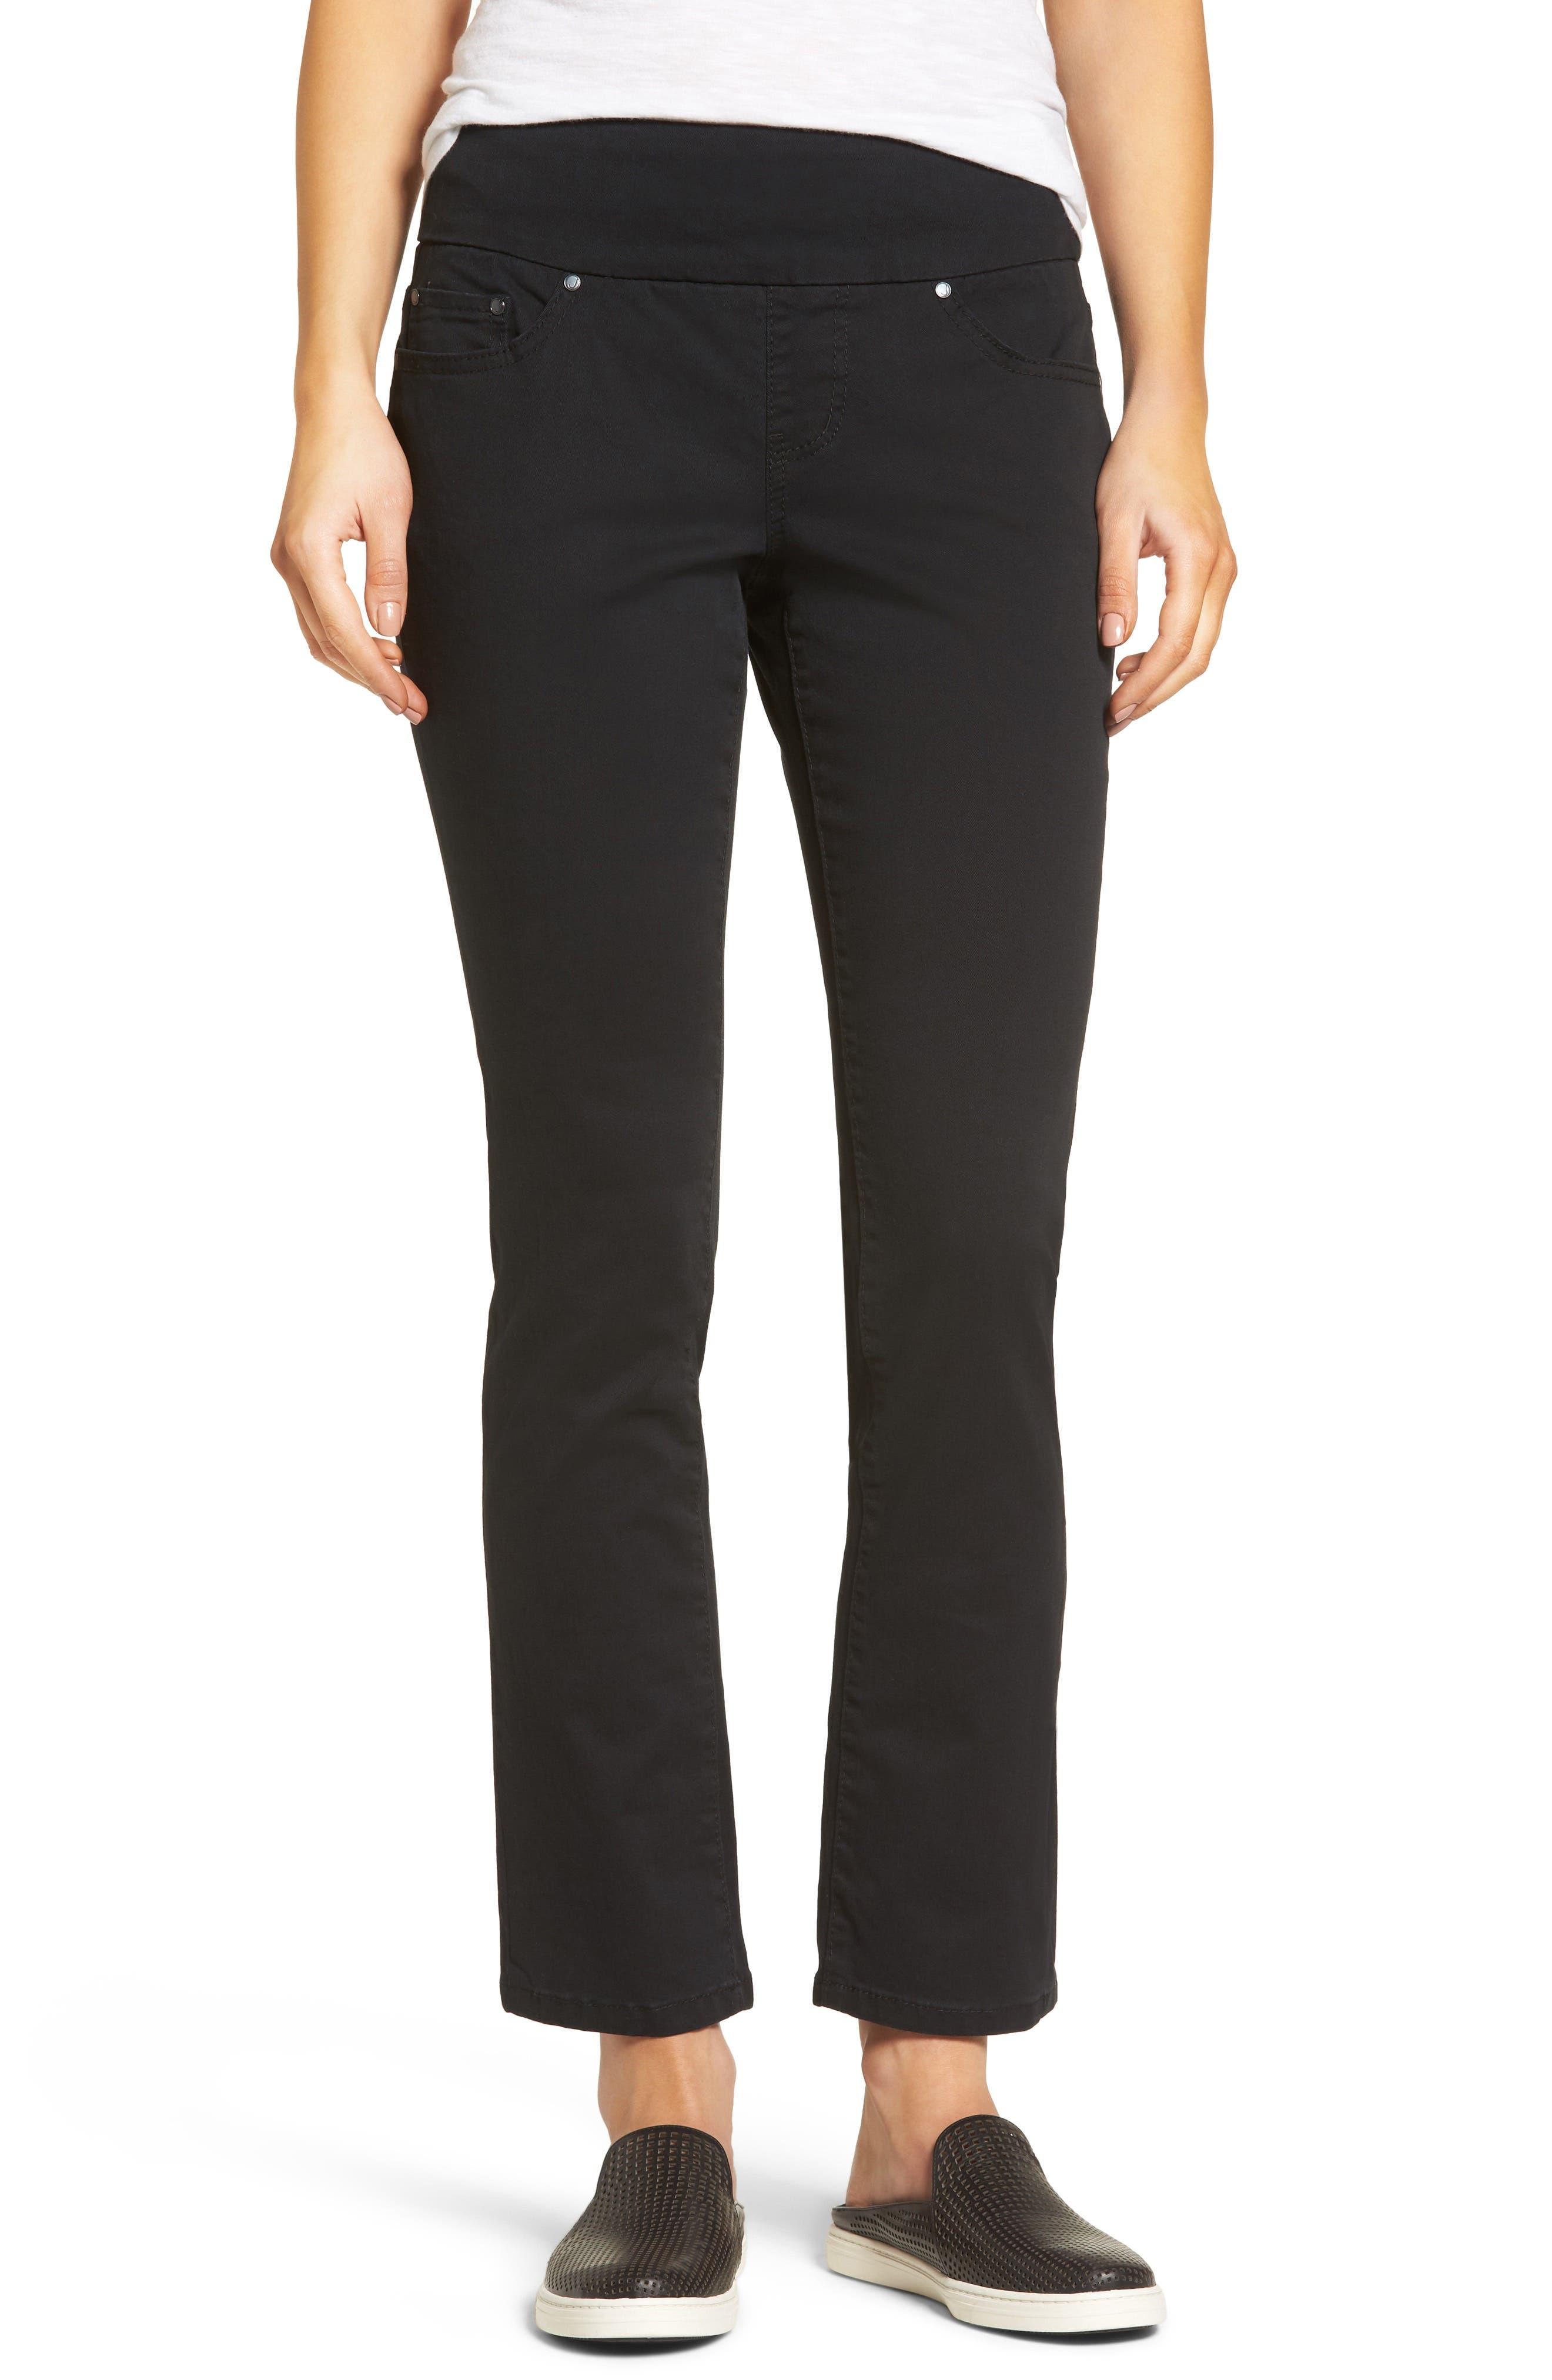 Alternate Image 1 Selected - Jag Jeans Peri Pull-On Twill Ankle Pants (Petite)